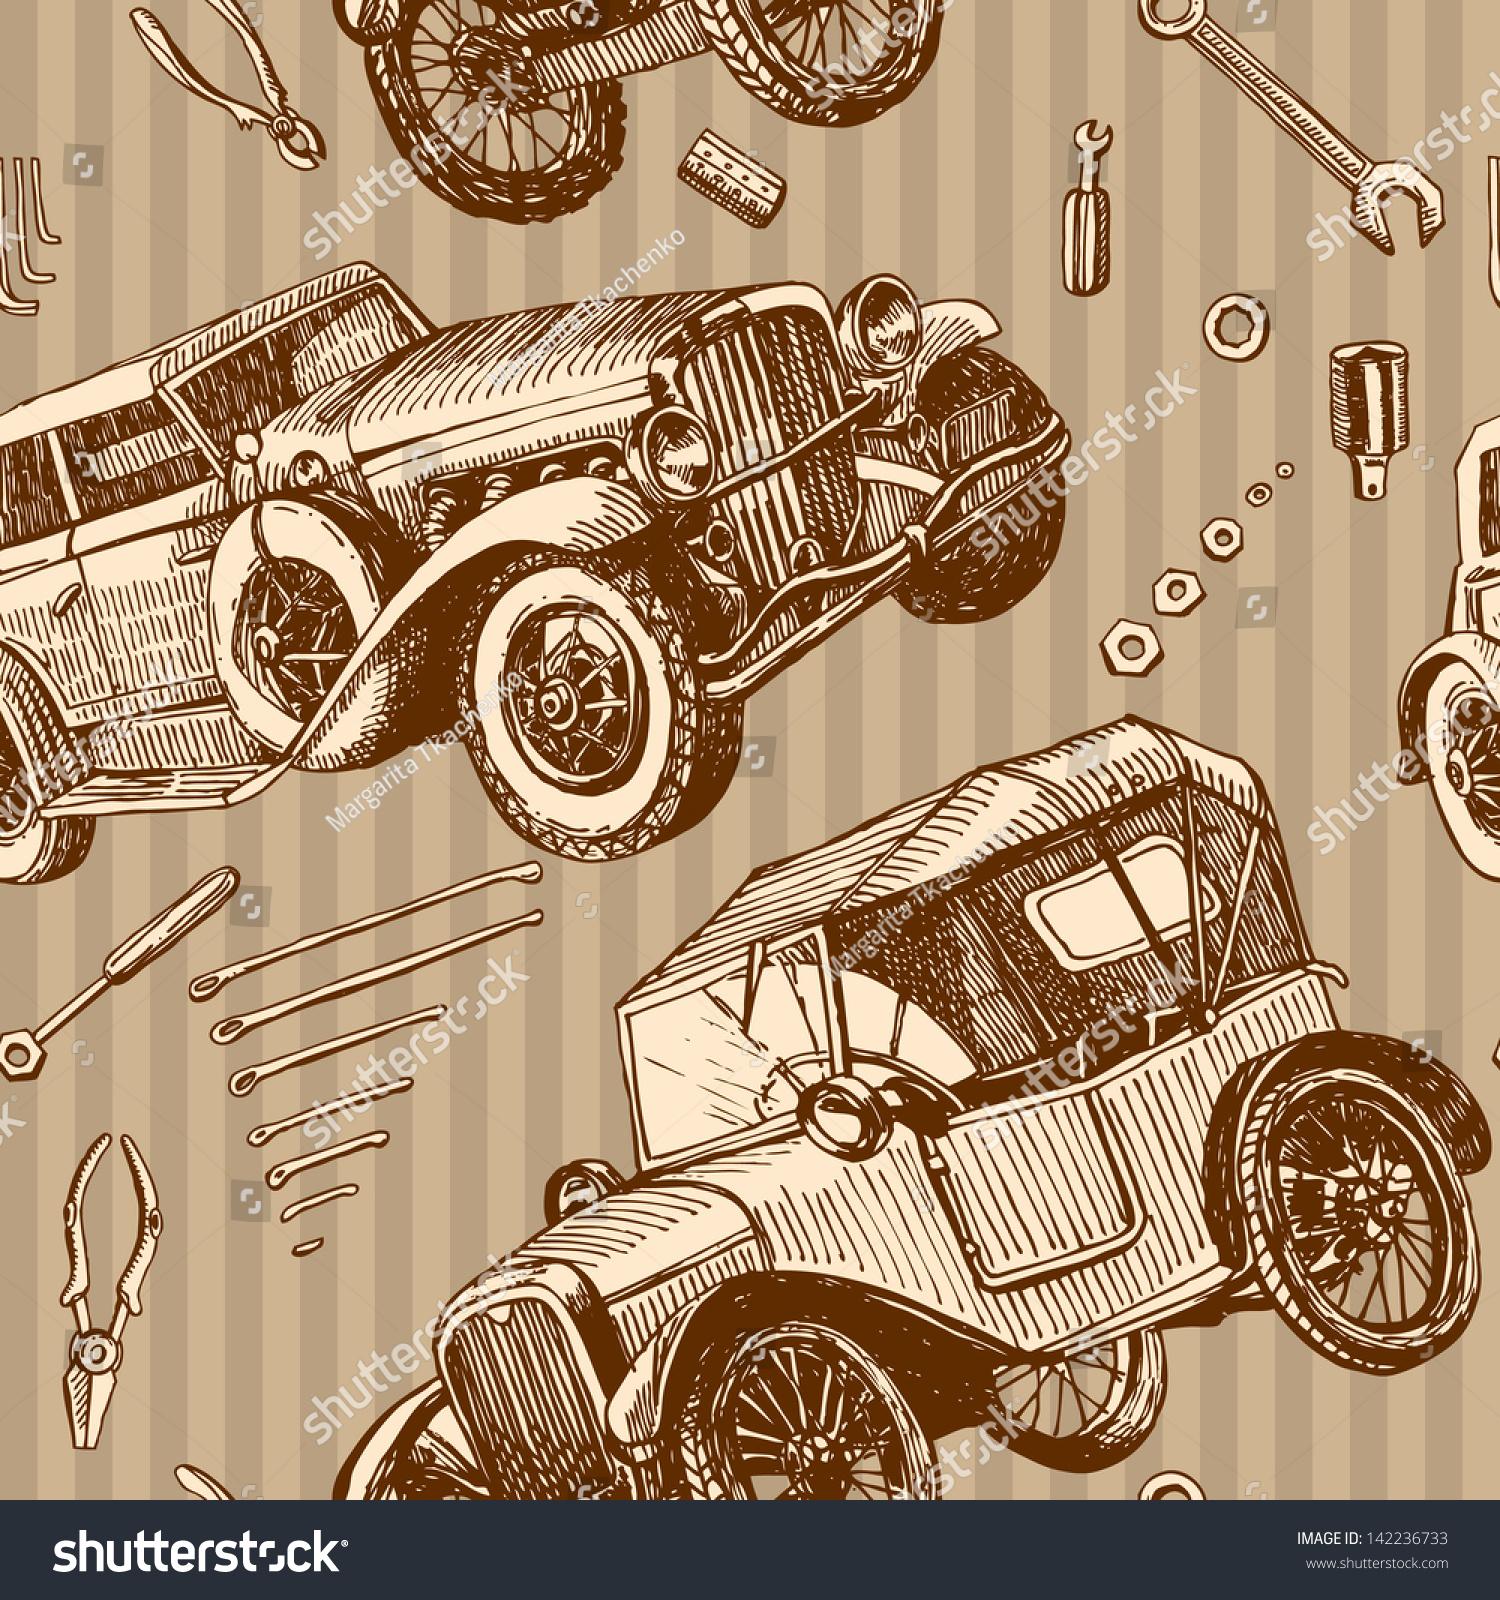 Seamless Pattern Vintage Cars Tools Repair Stock Vector HD (Royalty ...